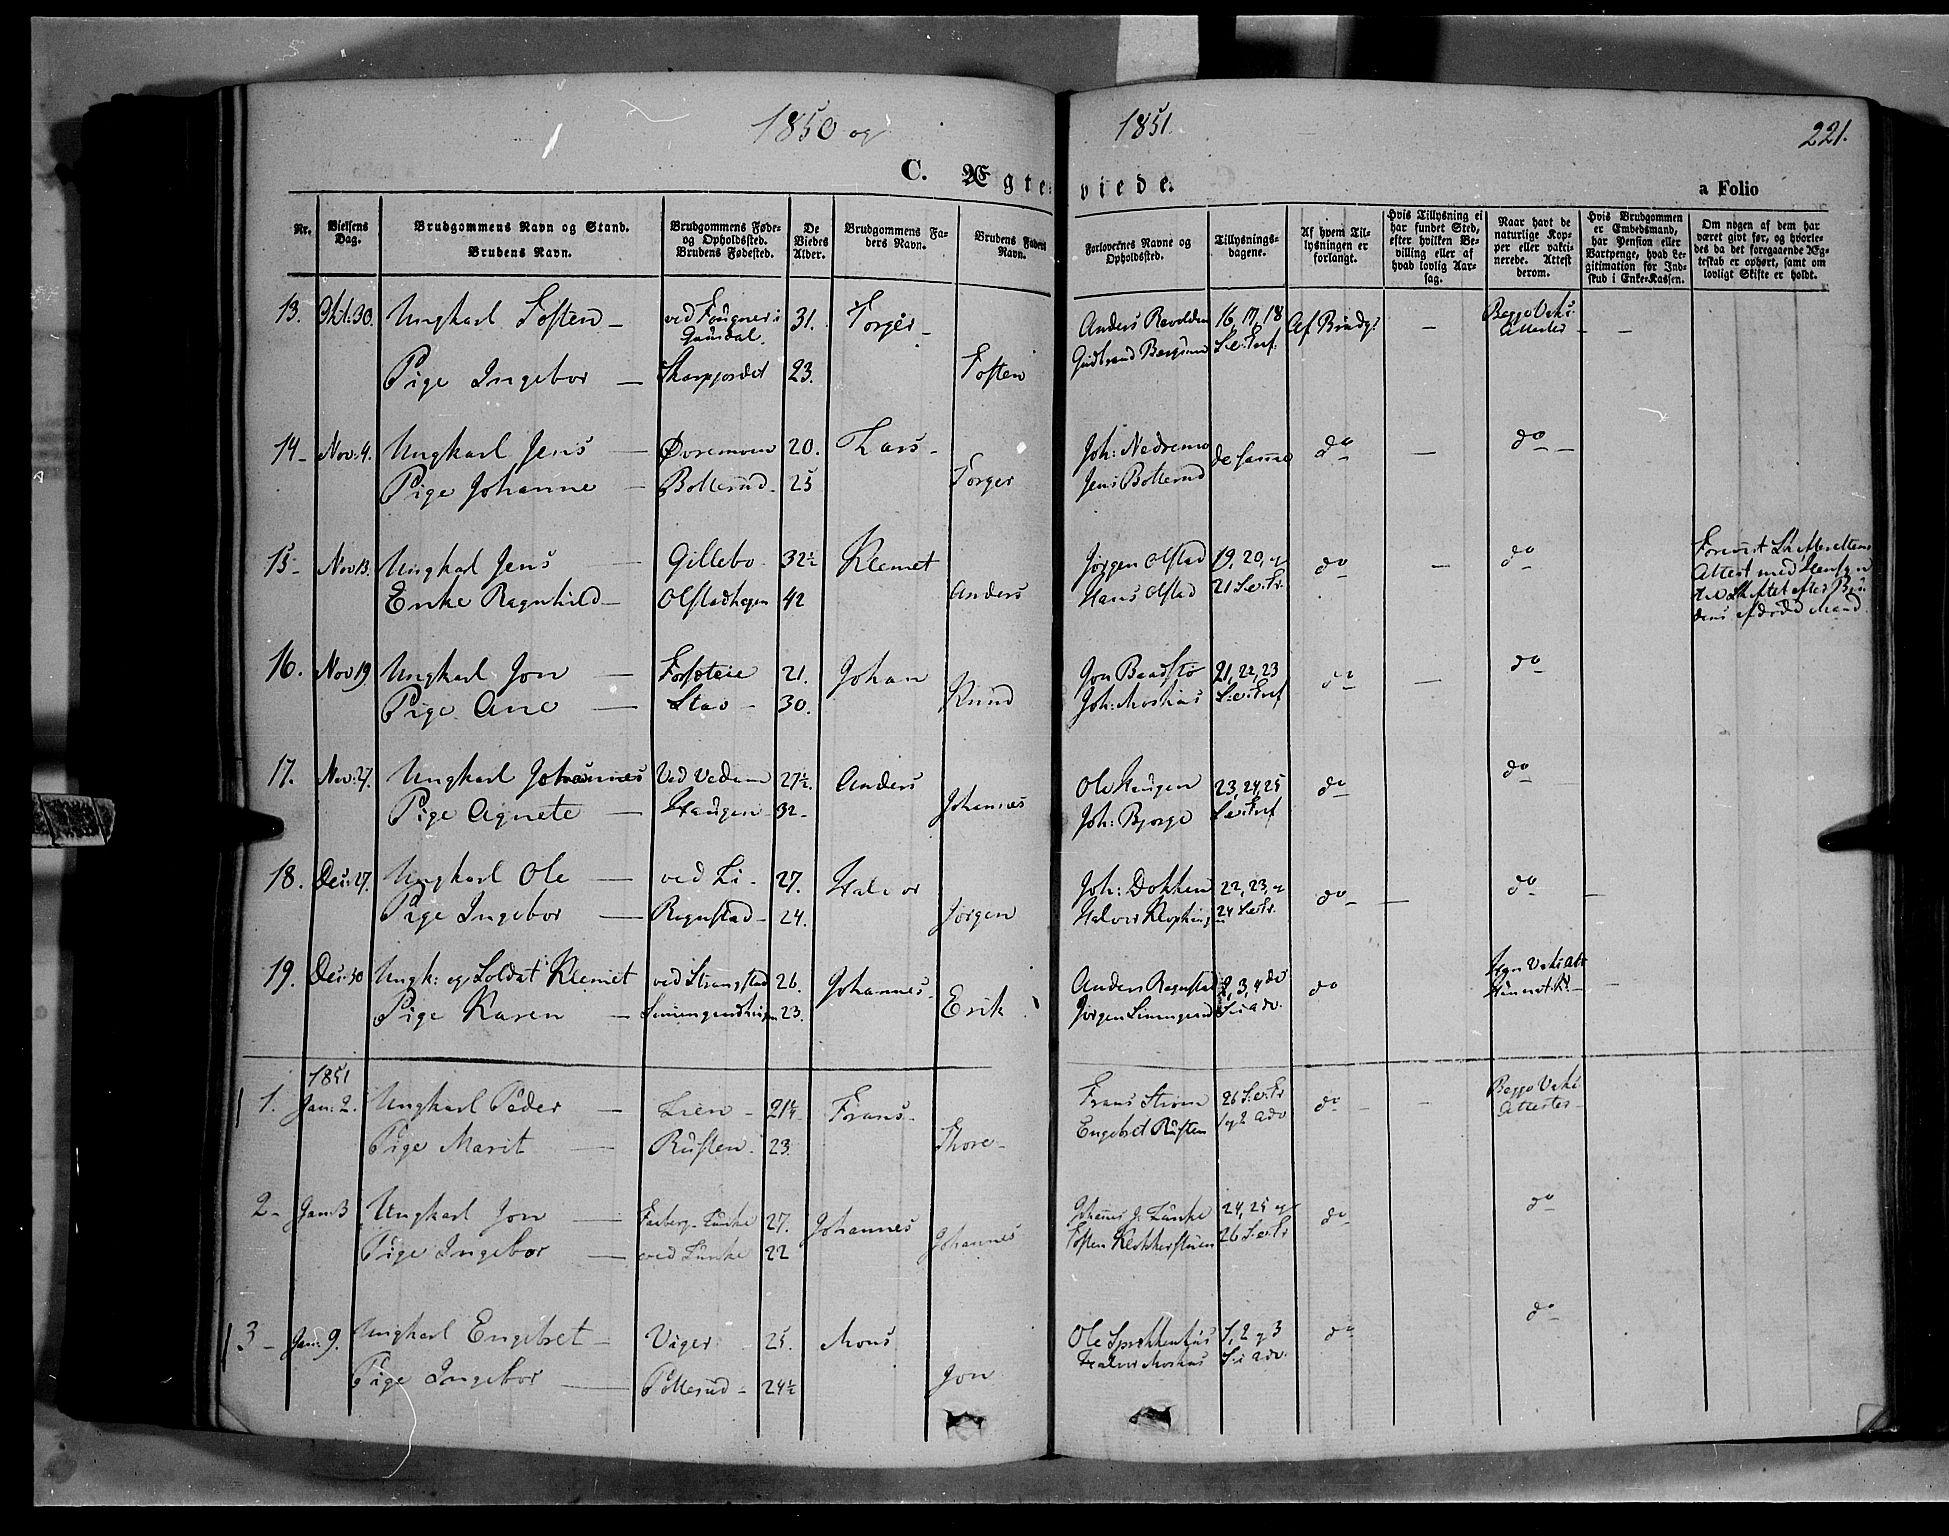 SAH, Øyer prestekontor, Ministerialbok nr. 5, 1842-1857, s. 221